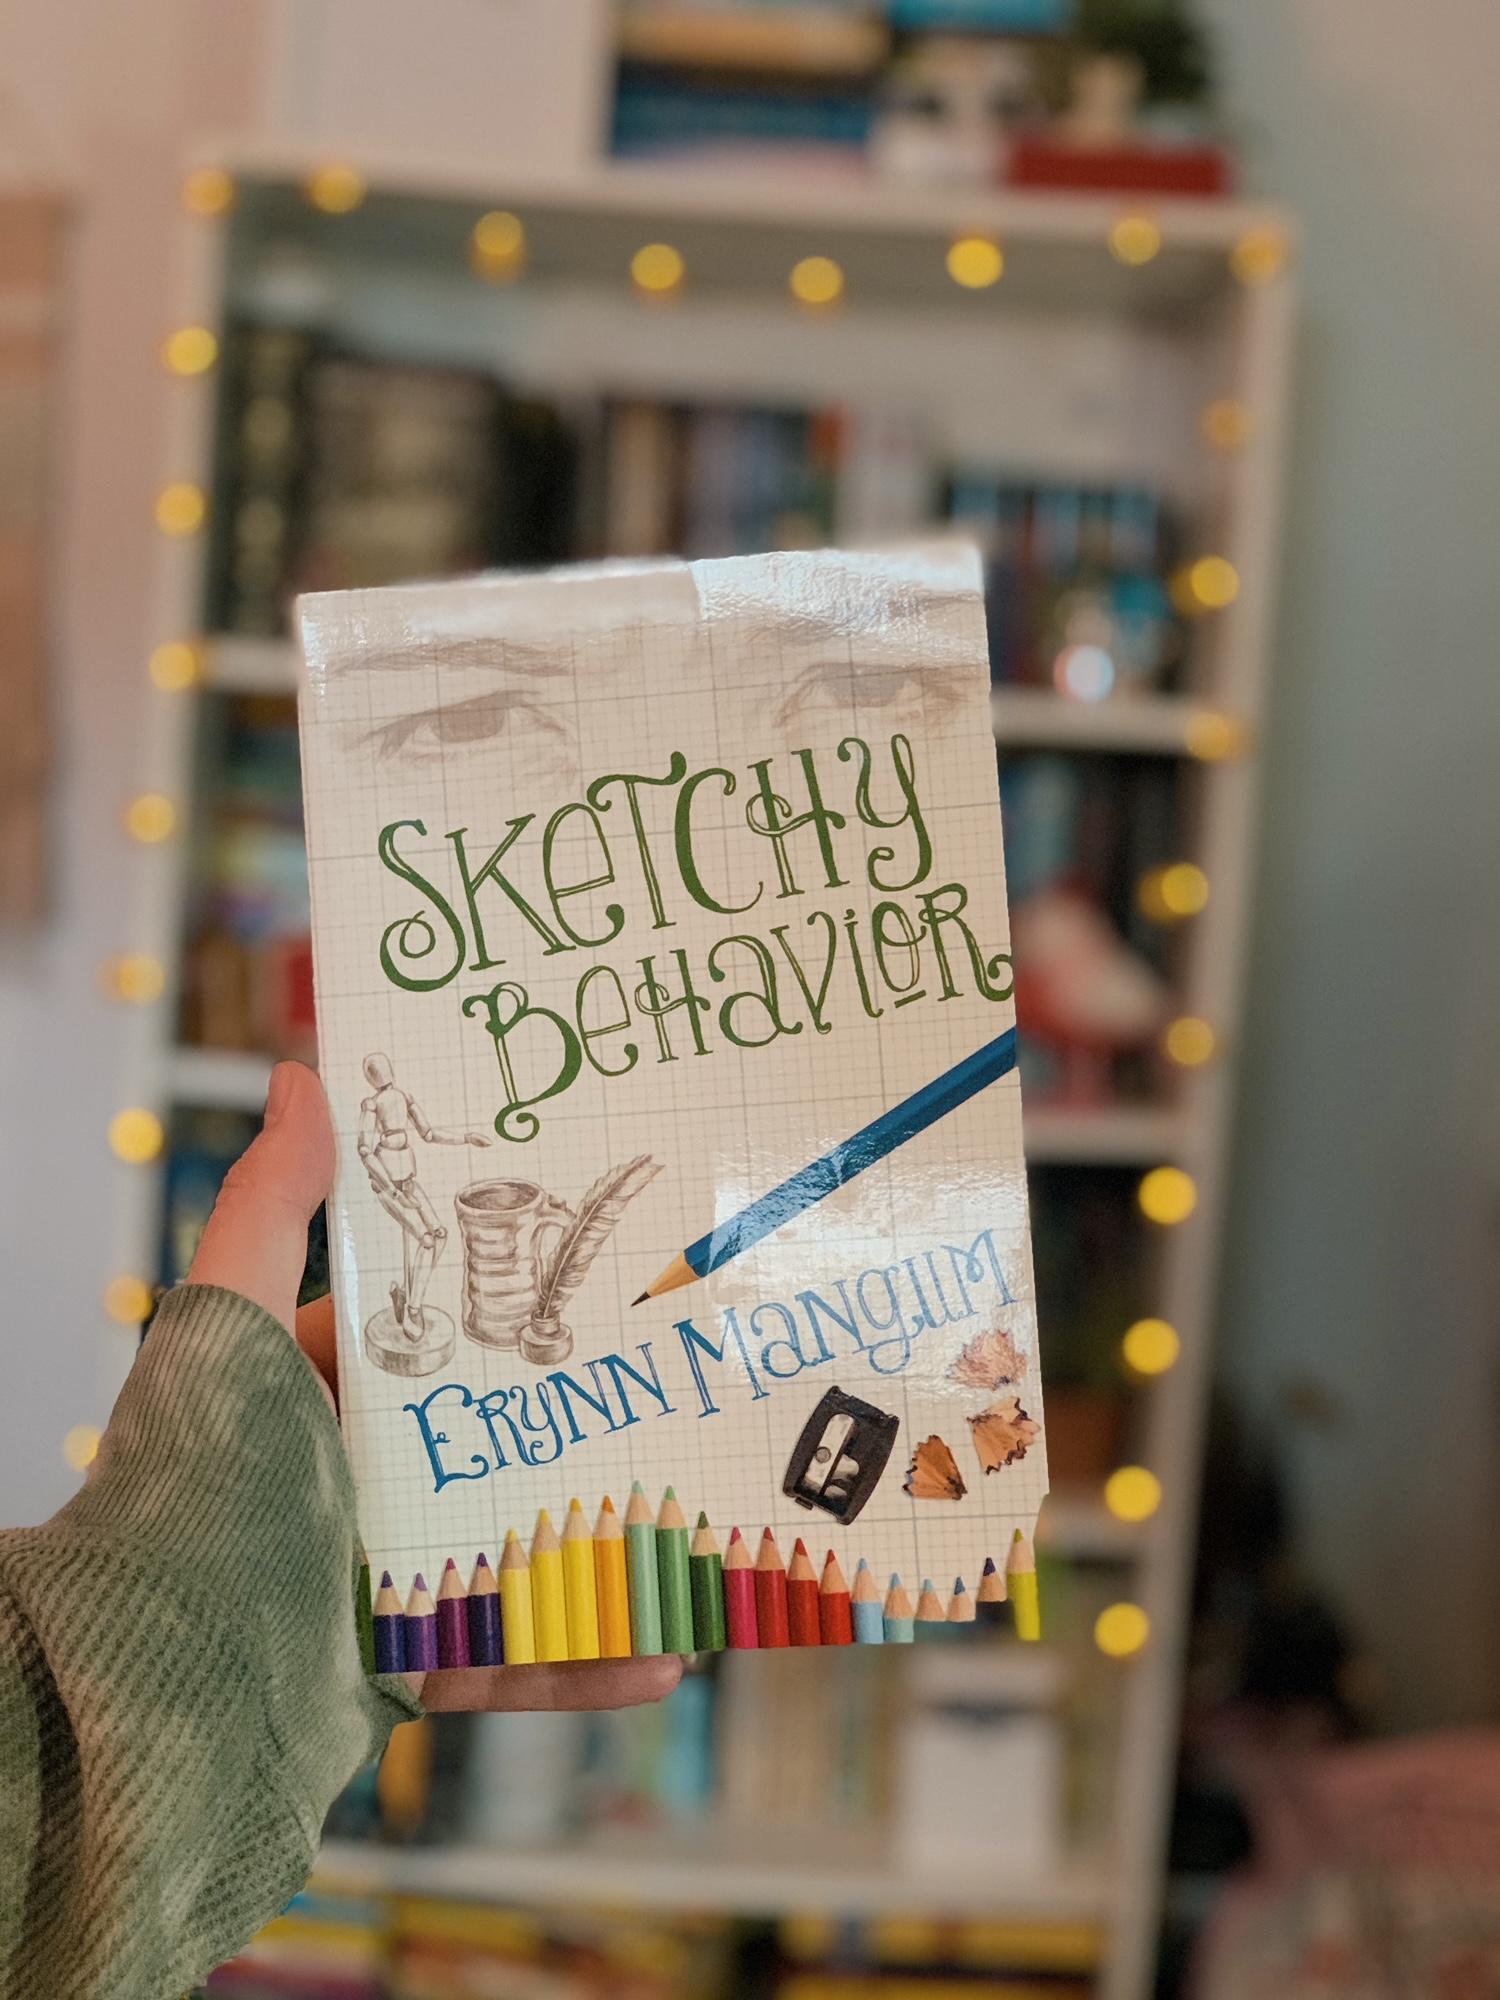 sketchy behavior review